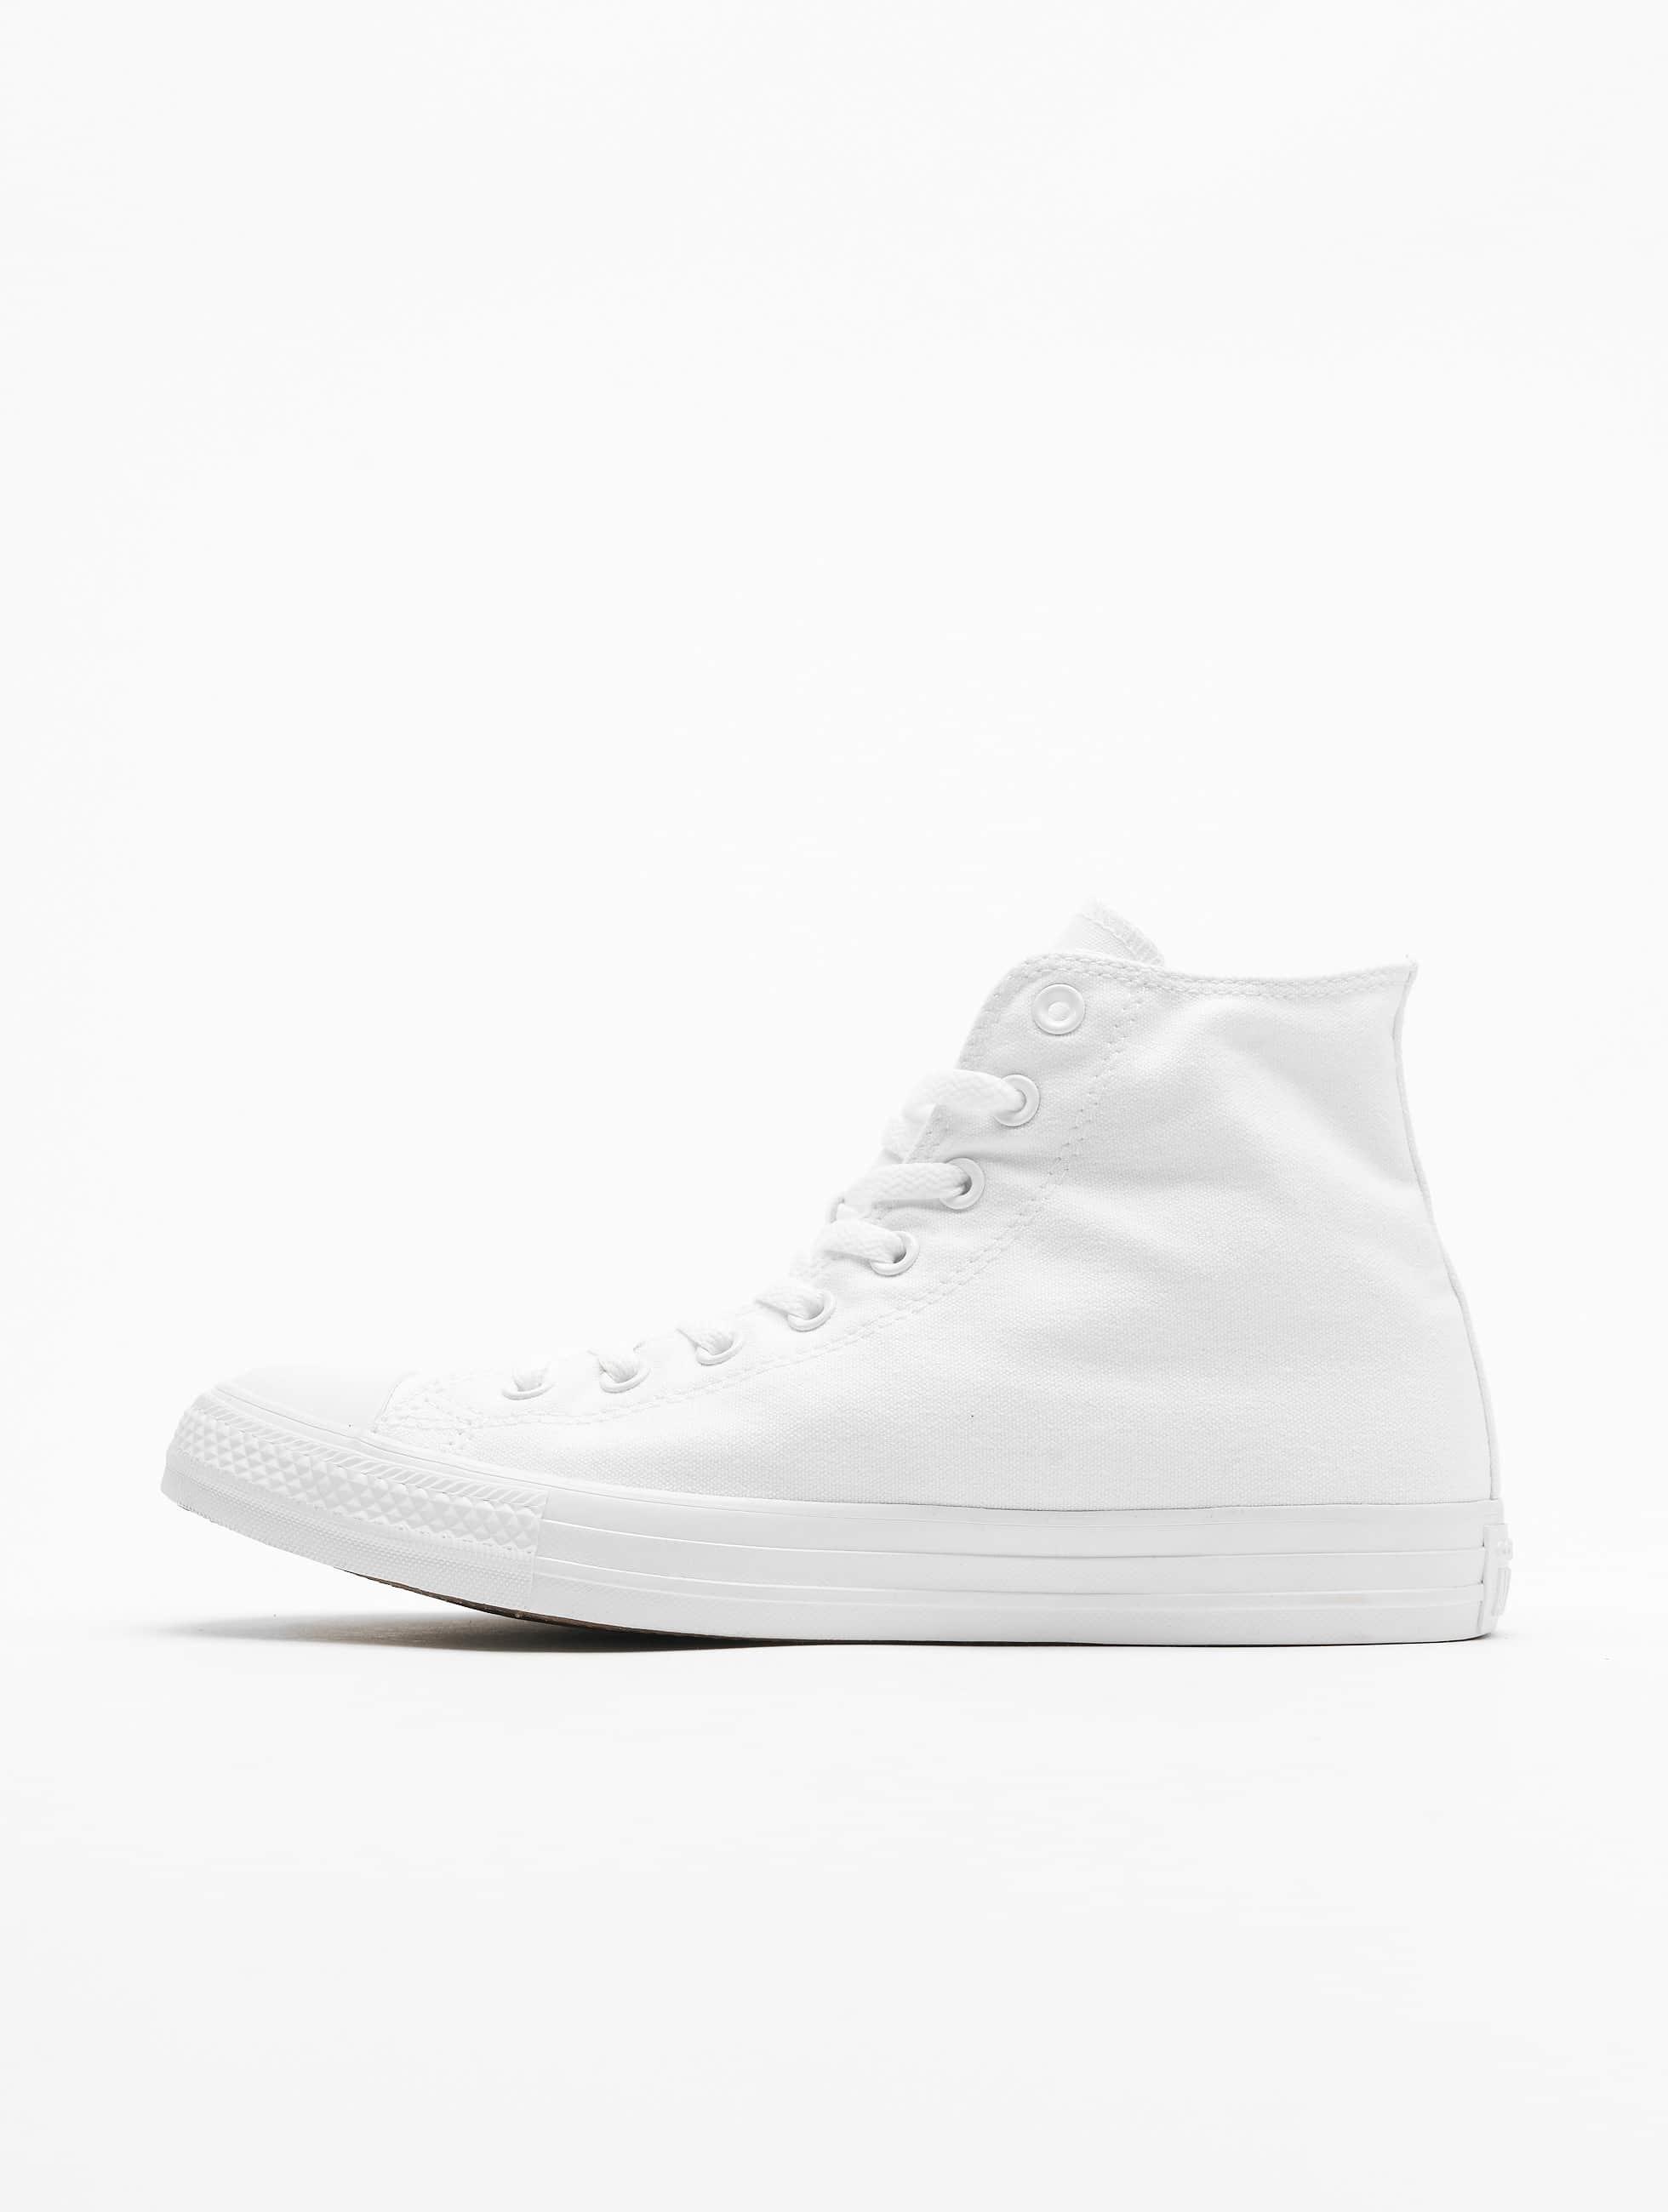 converse herren sneaker chuck taylor all star high in wei. Black Bedroom Furniture Sets. Home Design Ideas